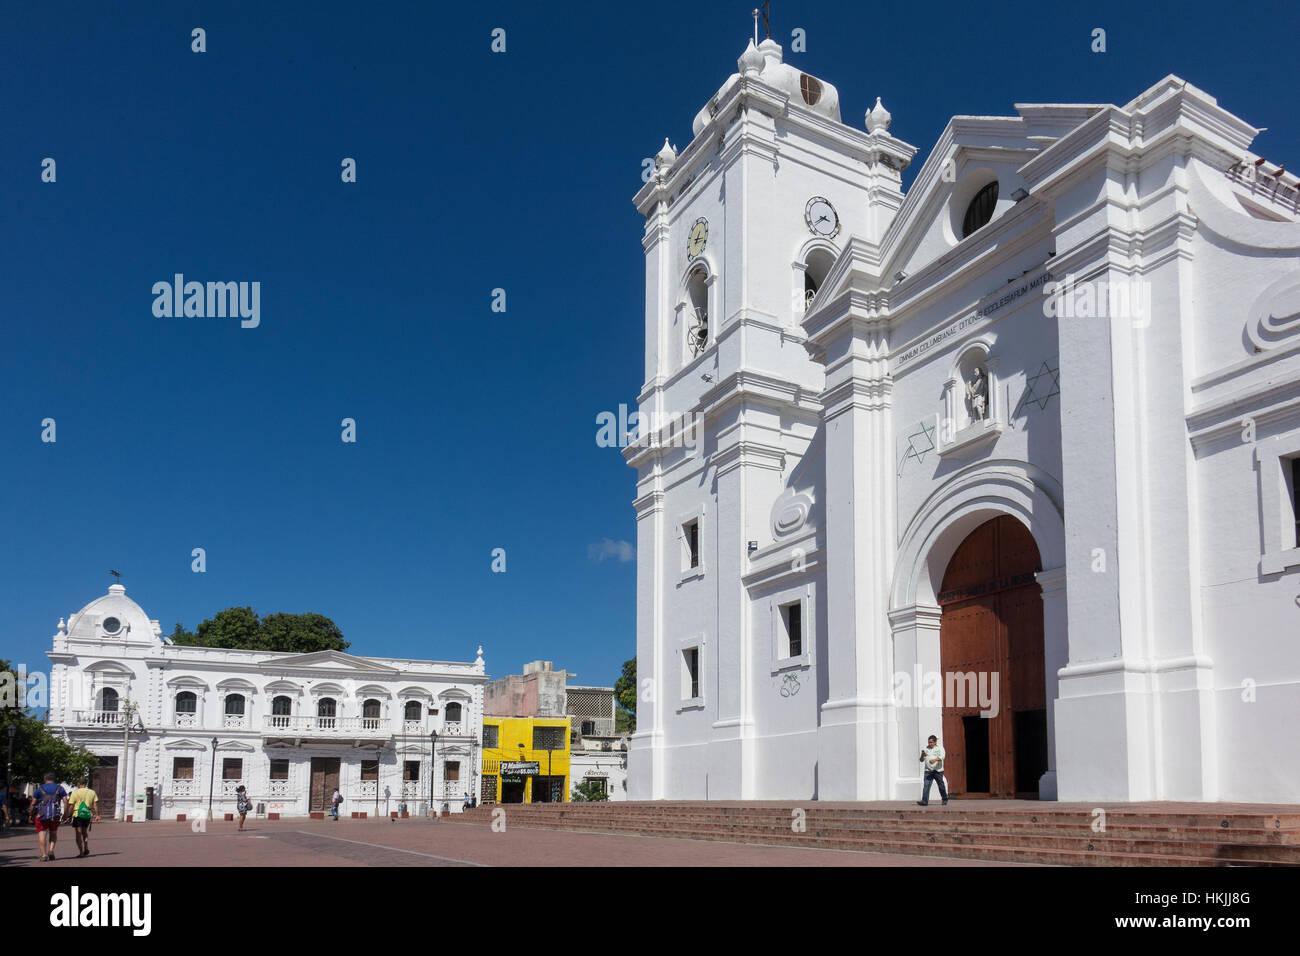 Colombia, Magdalena, Santa Marta, cathedral square - Stock Image